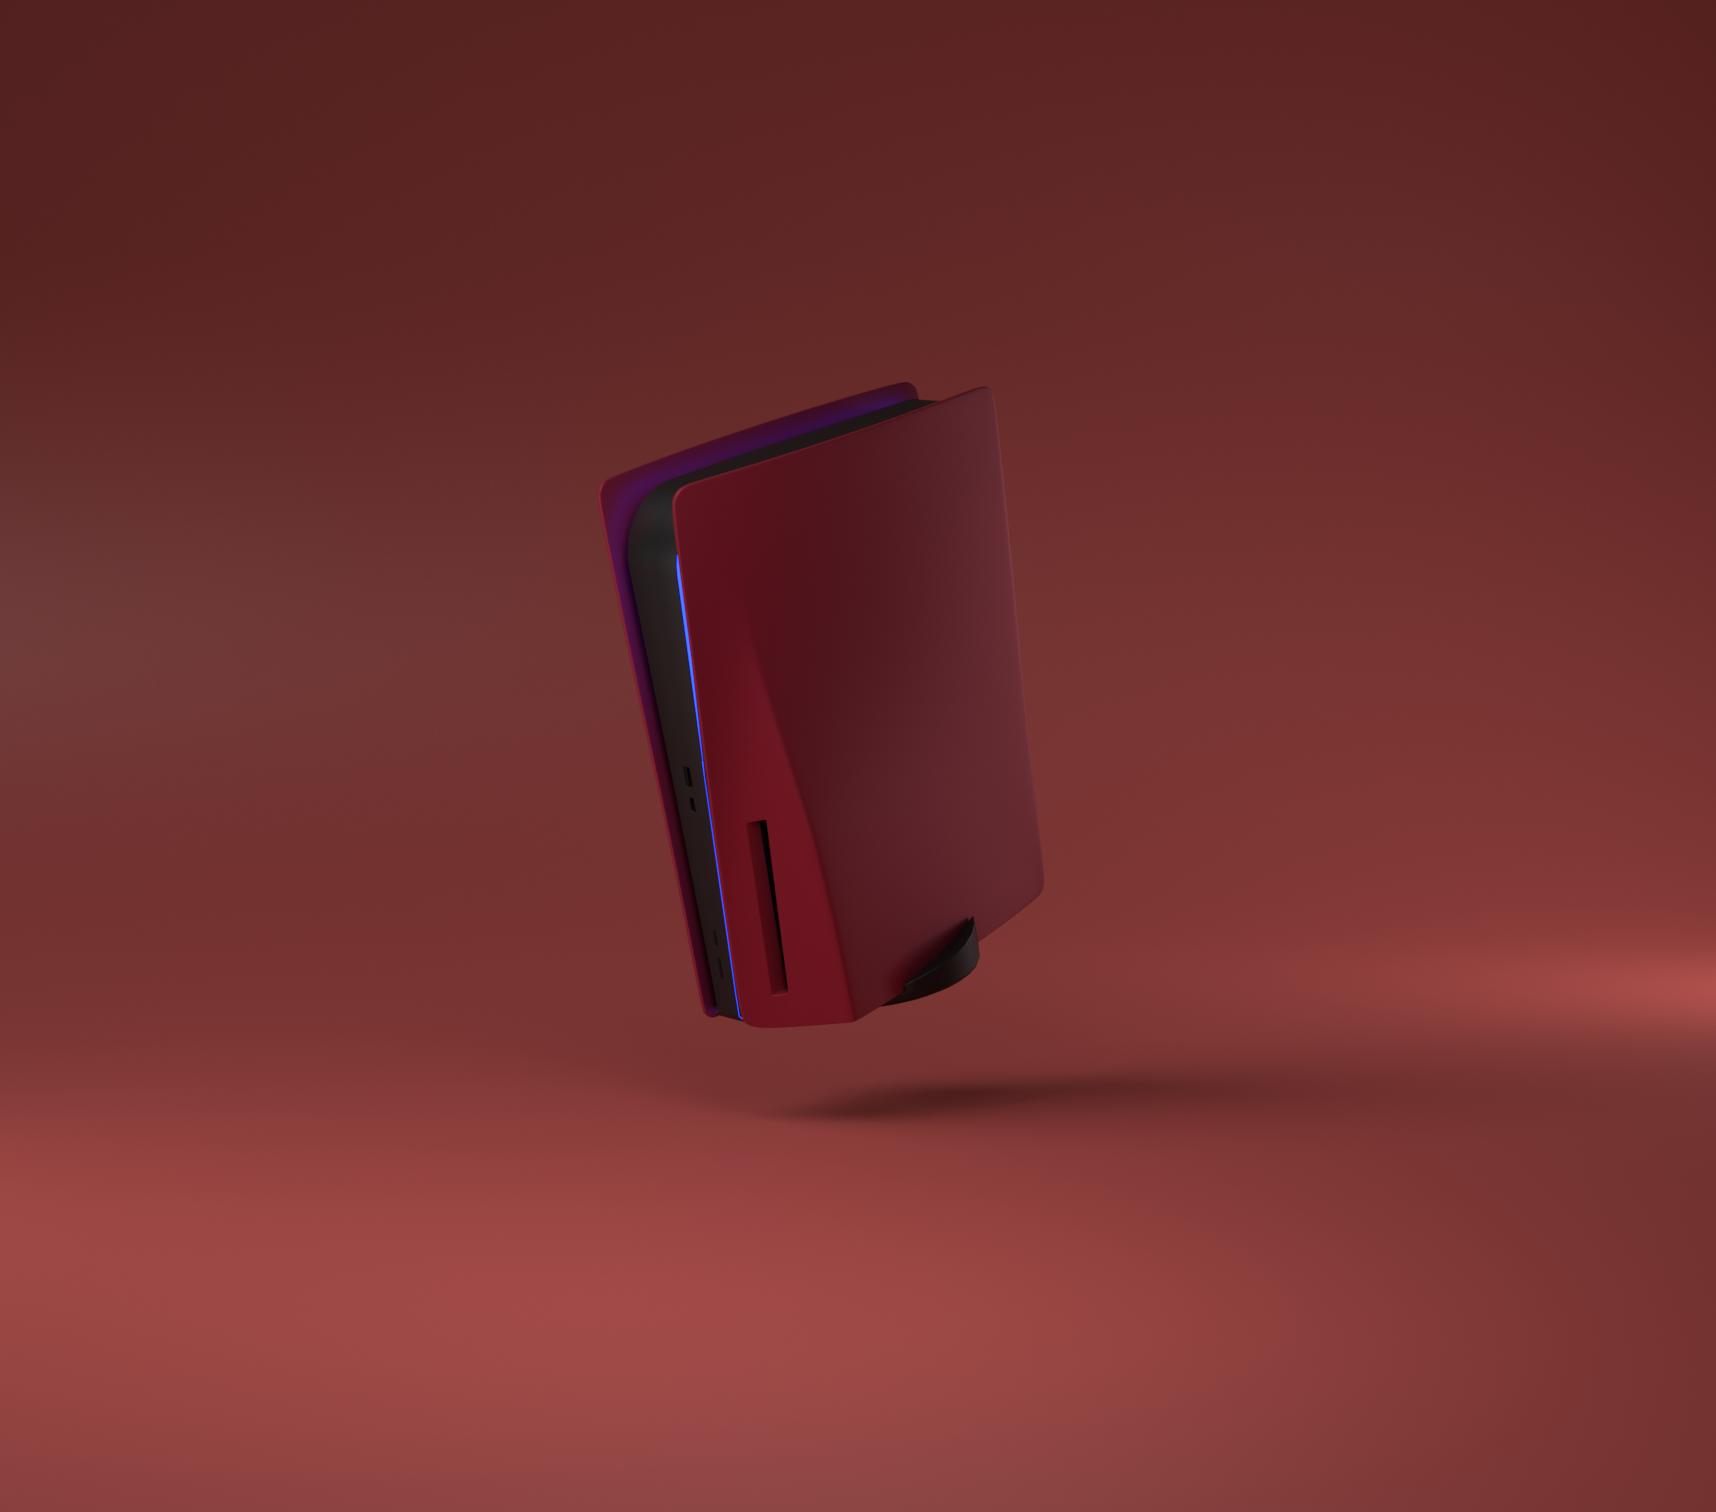 PlayStation 5 Rouge Cerise